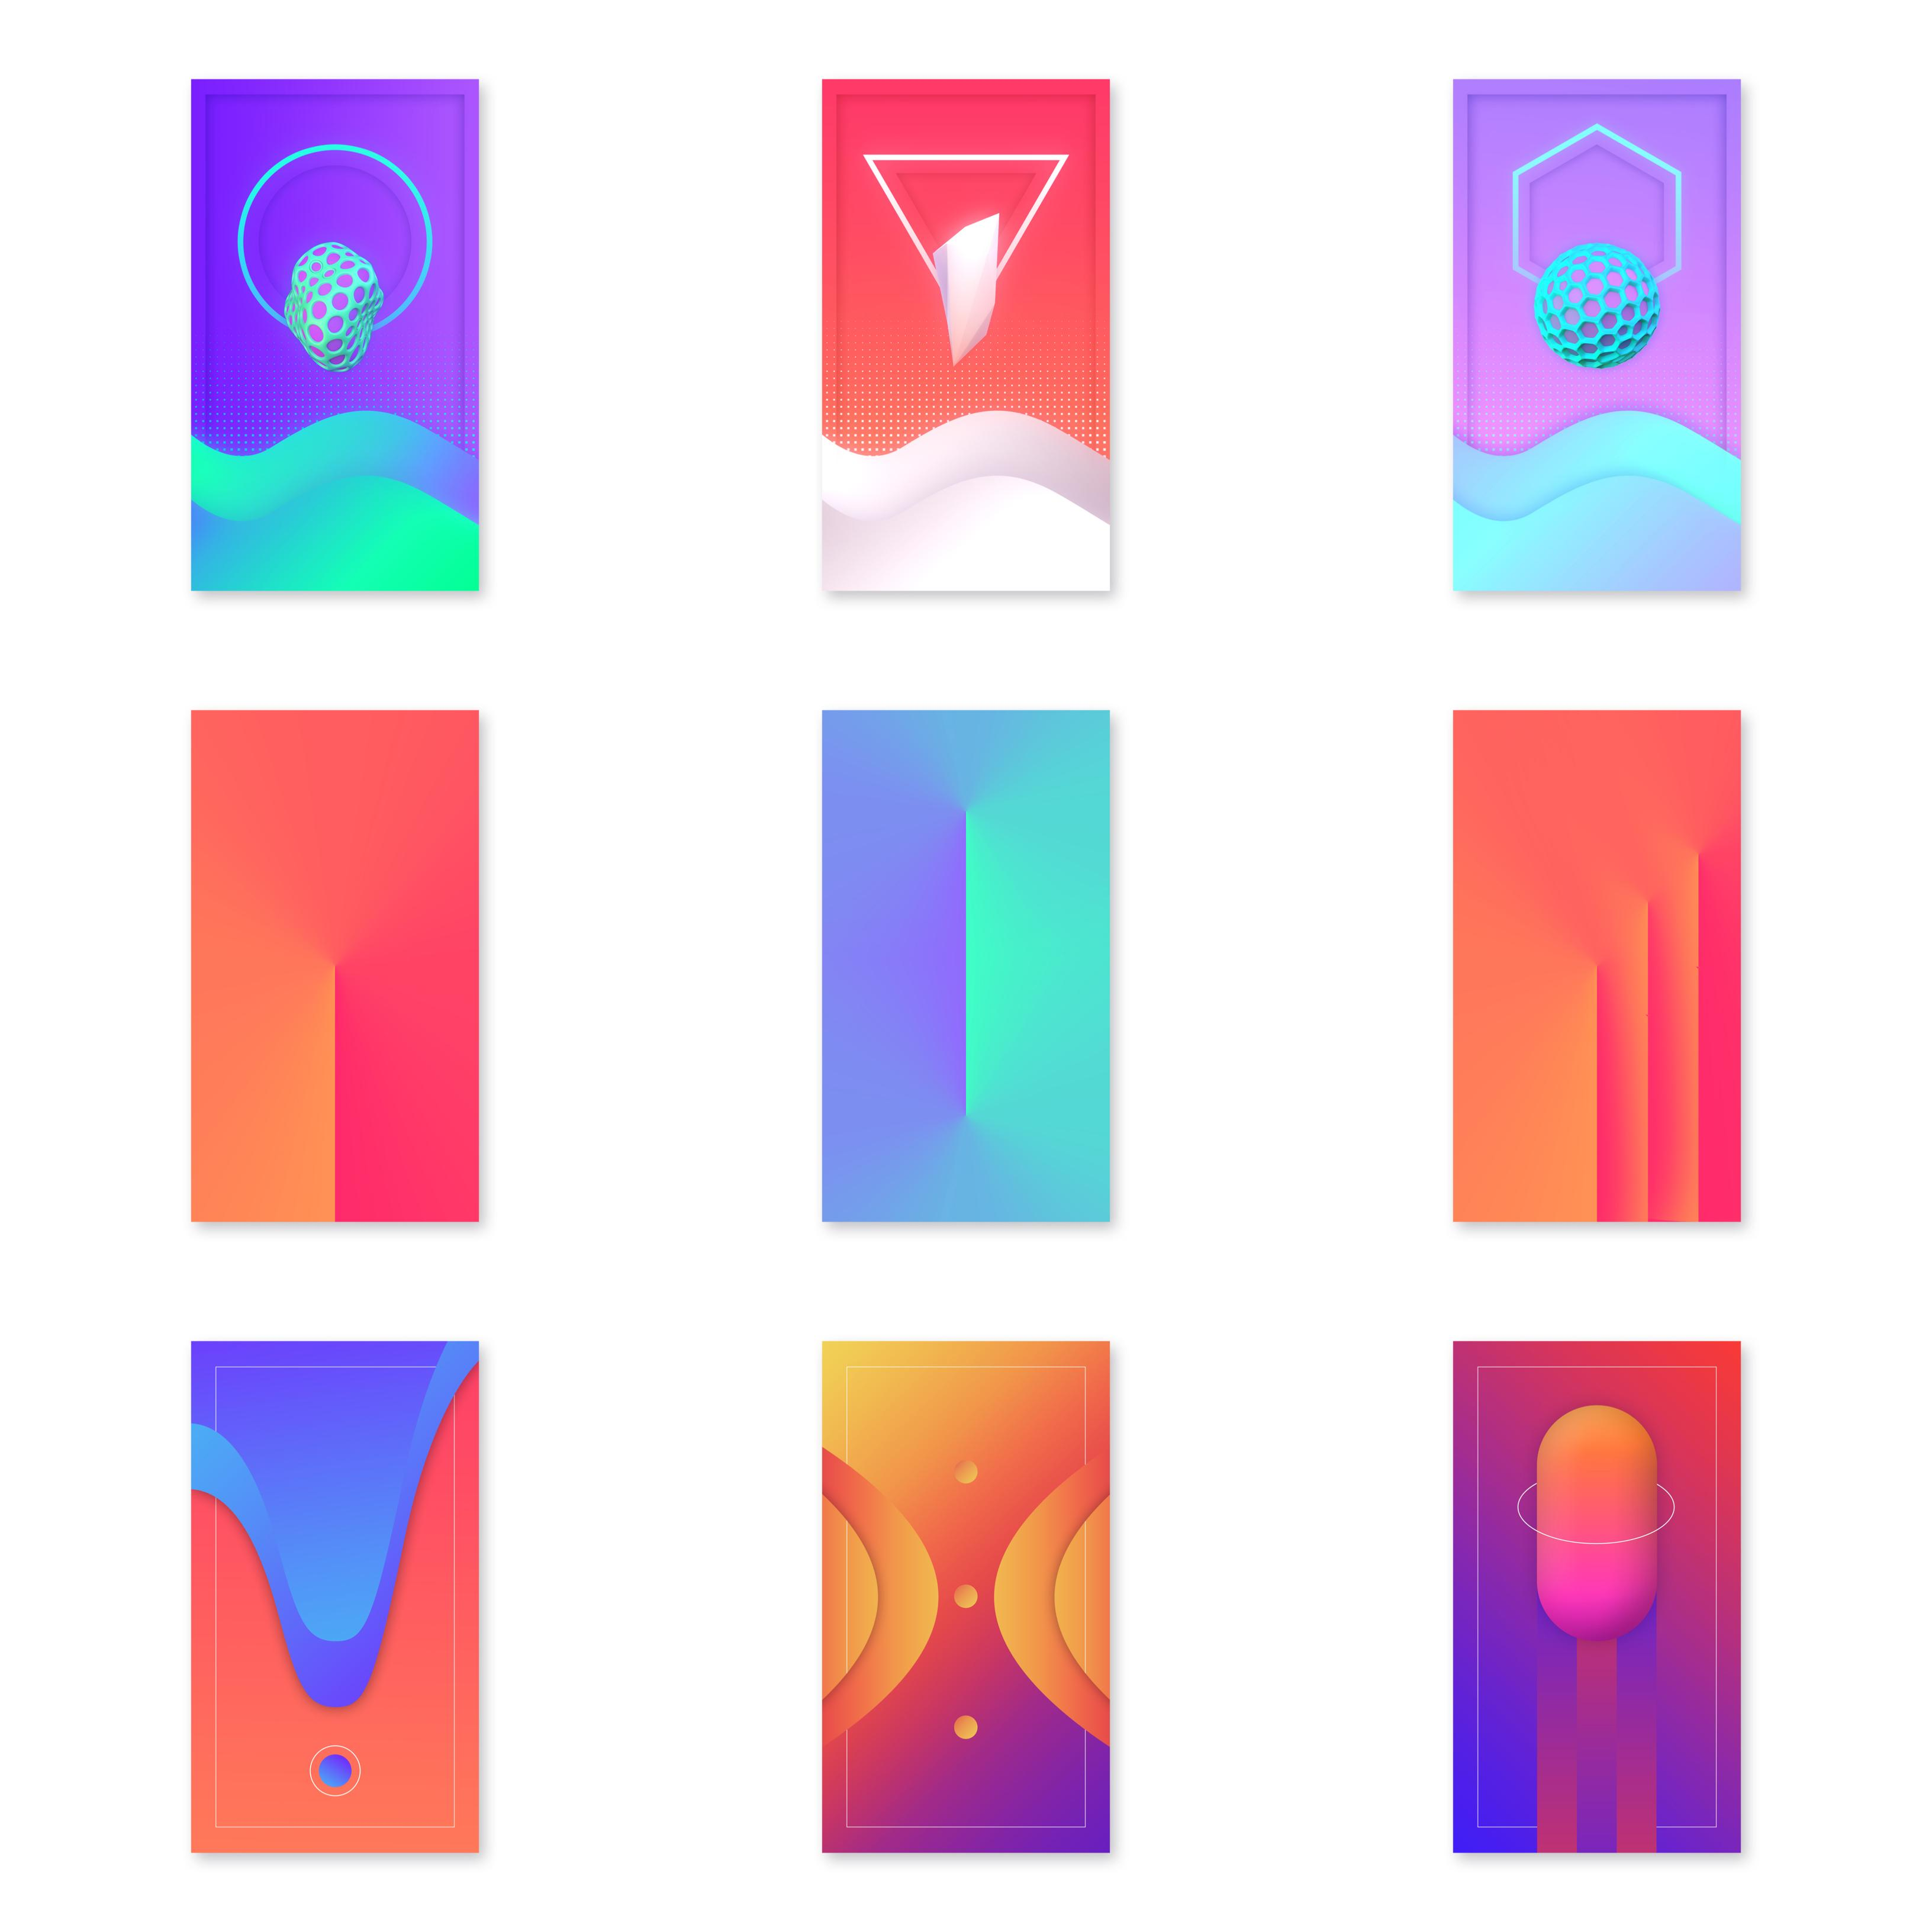 i make phone wallpapers